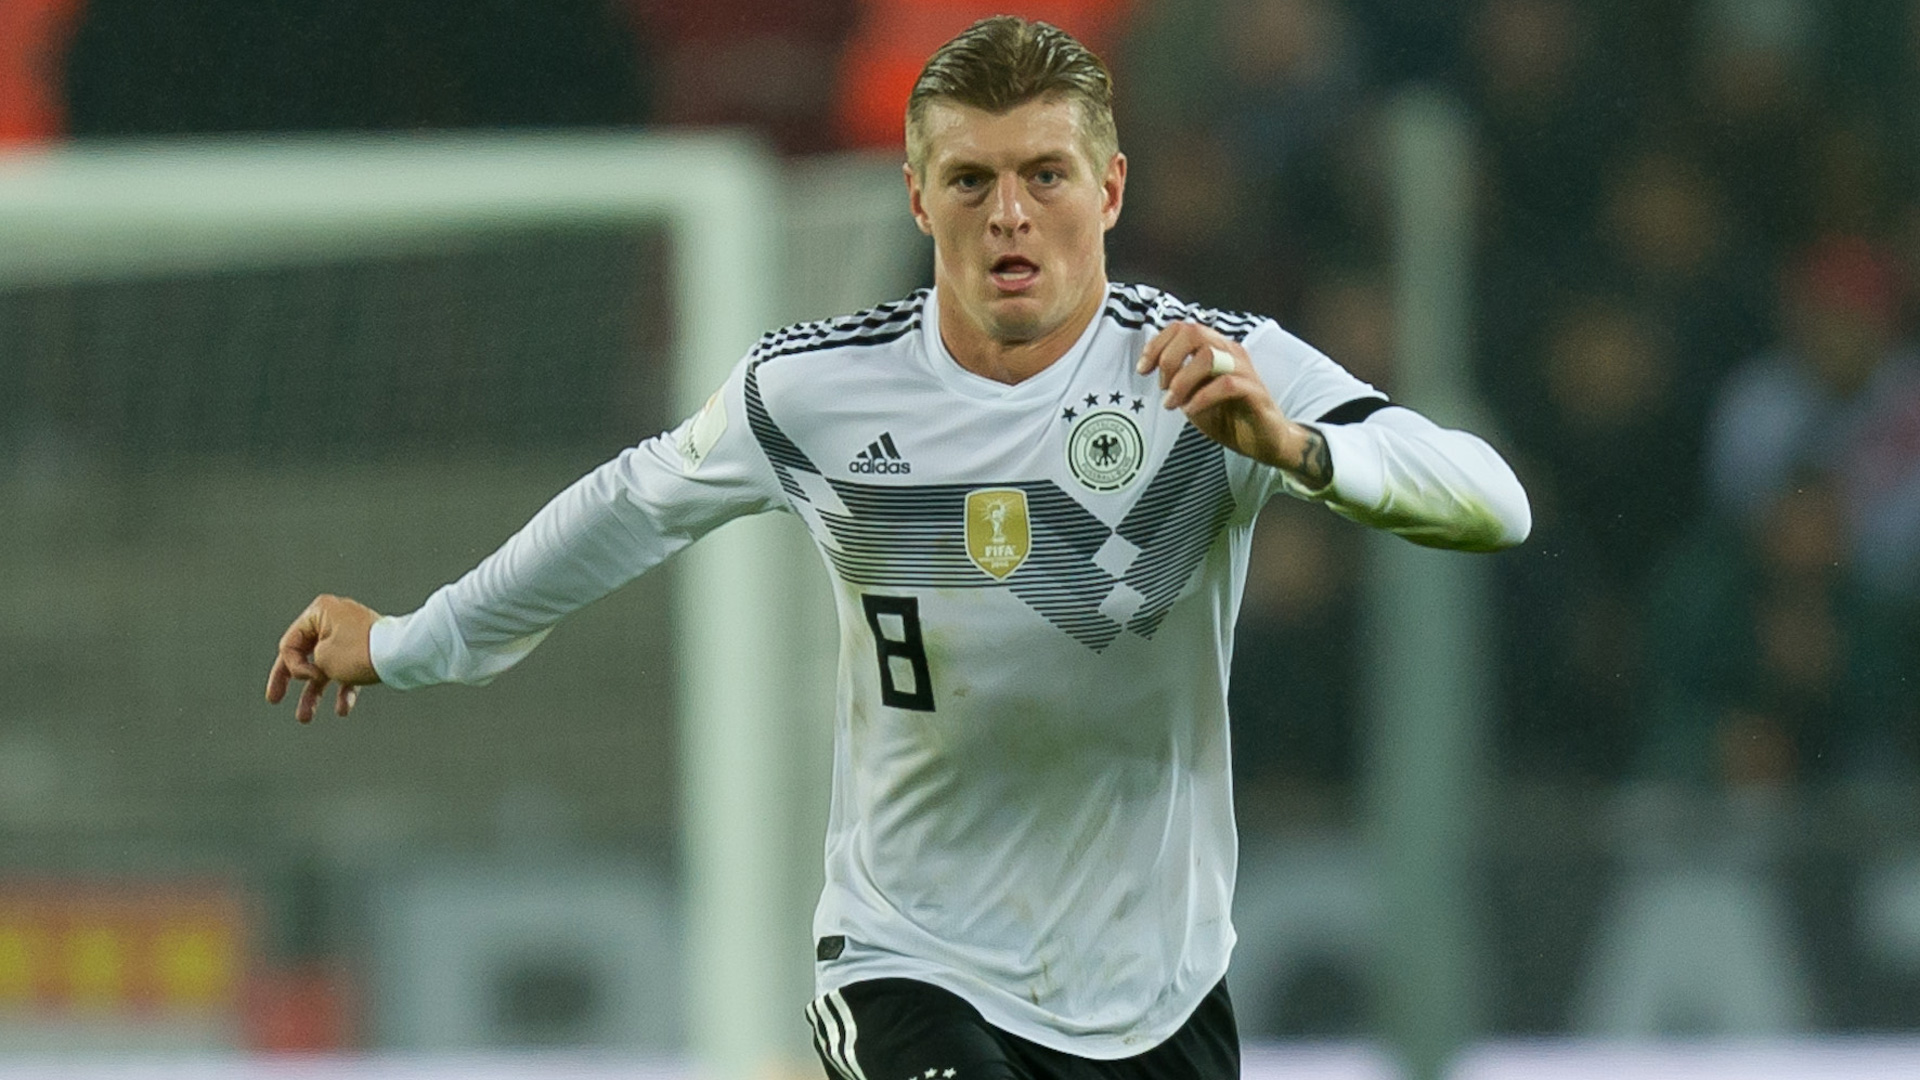 Toni Kroos DFB Germany 2018